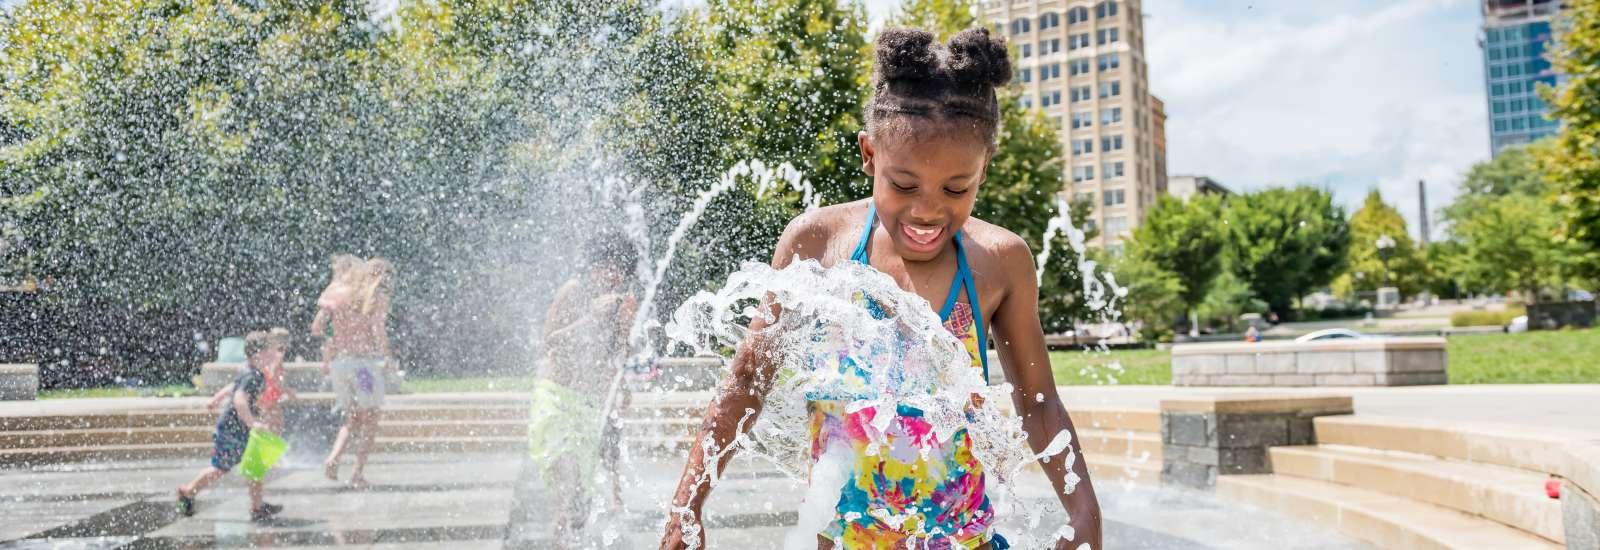 Girl playing in fountain at Splashveille park in Asheville